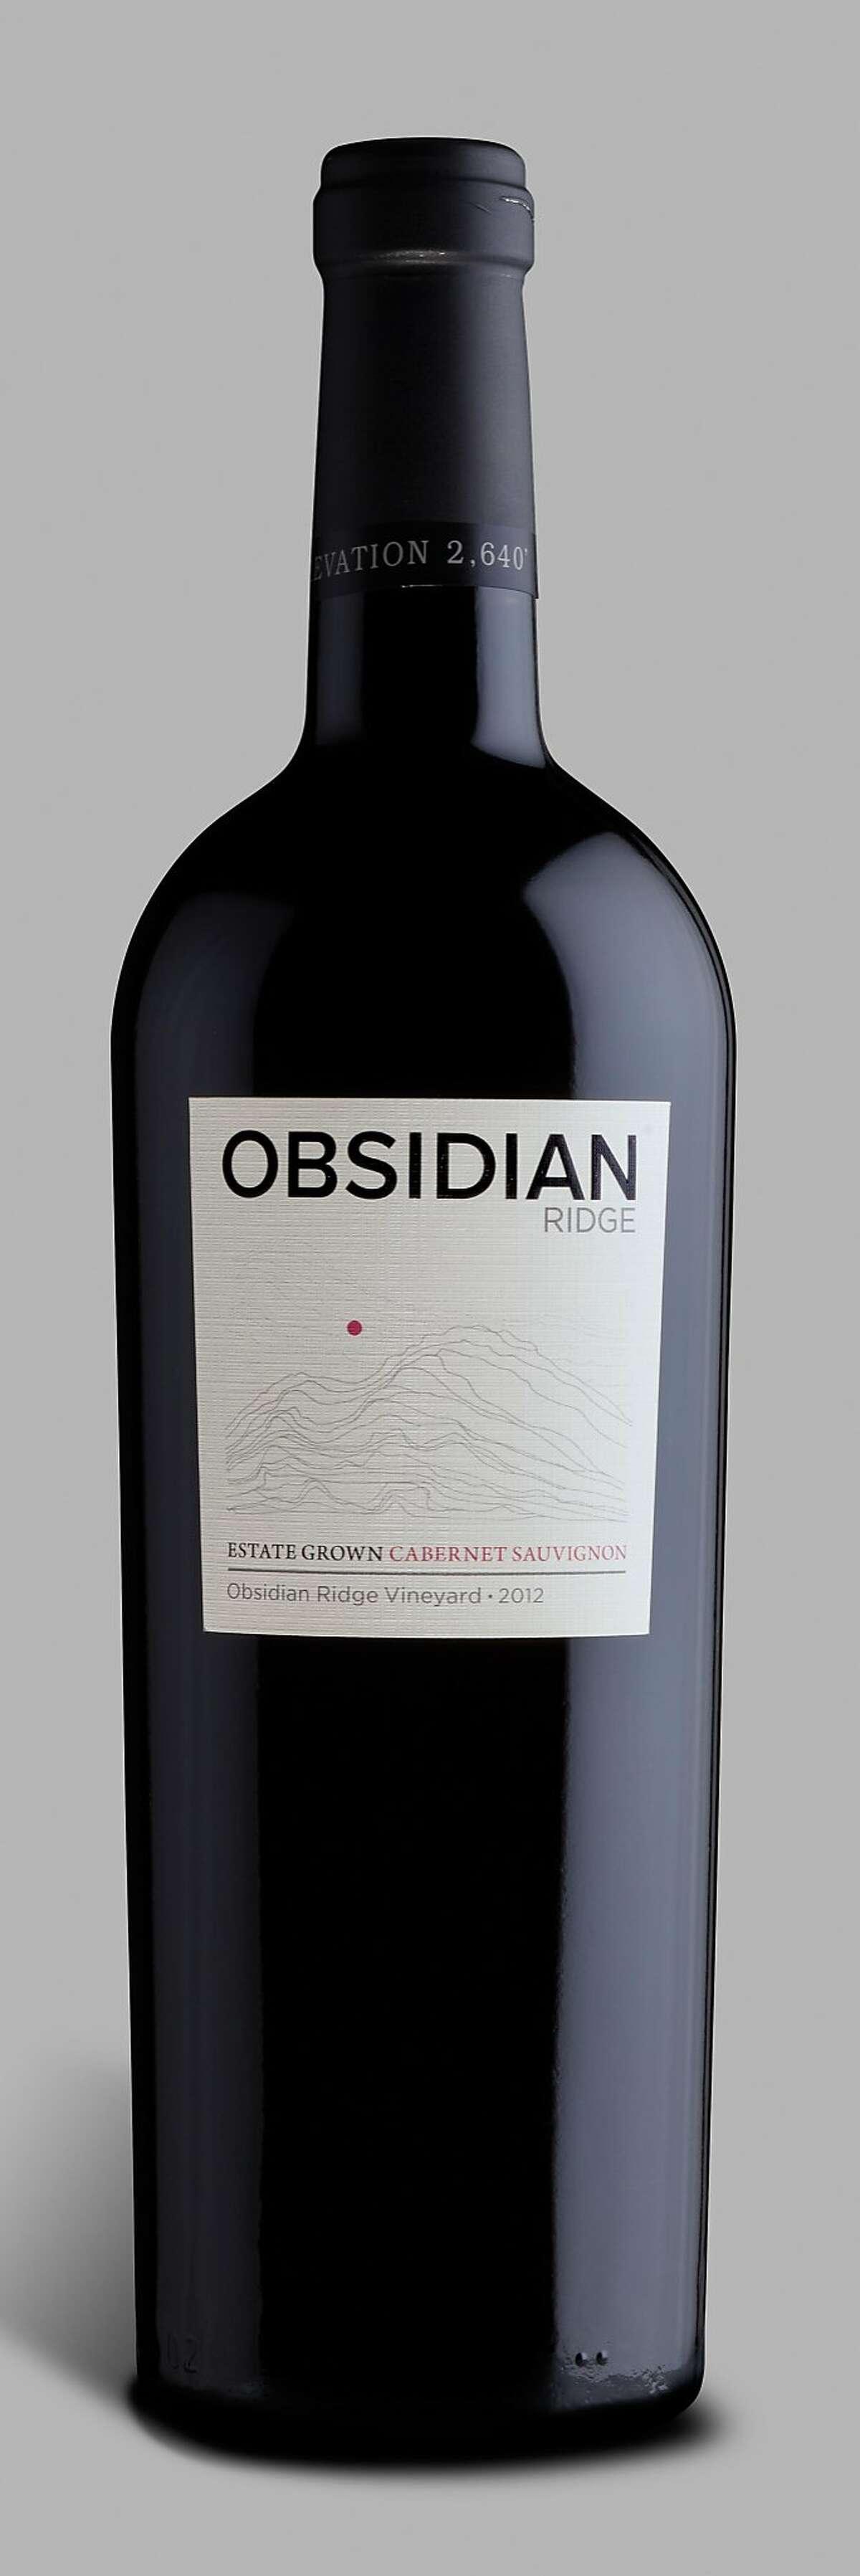 Obsidian Ridge Cabernet Sauvignon